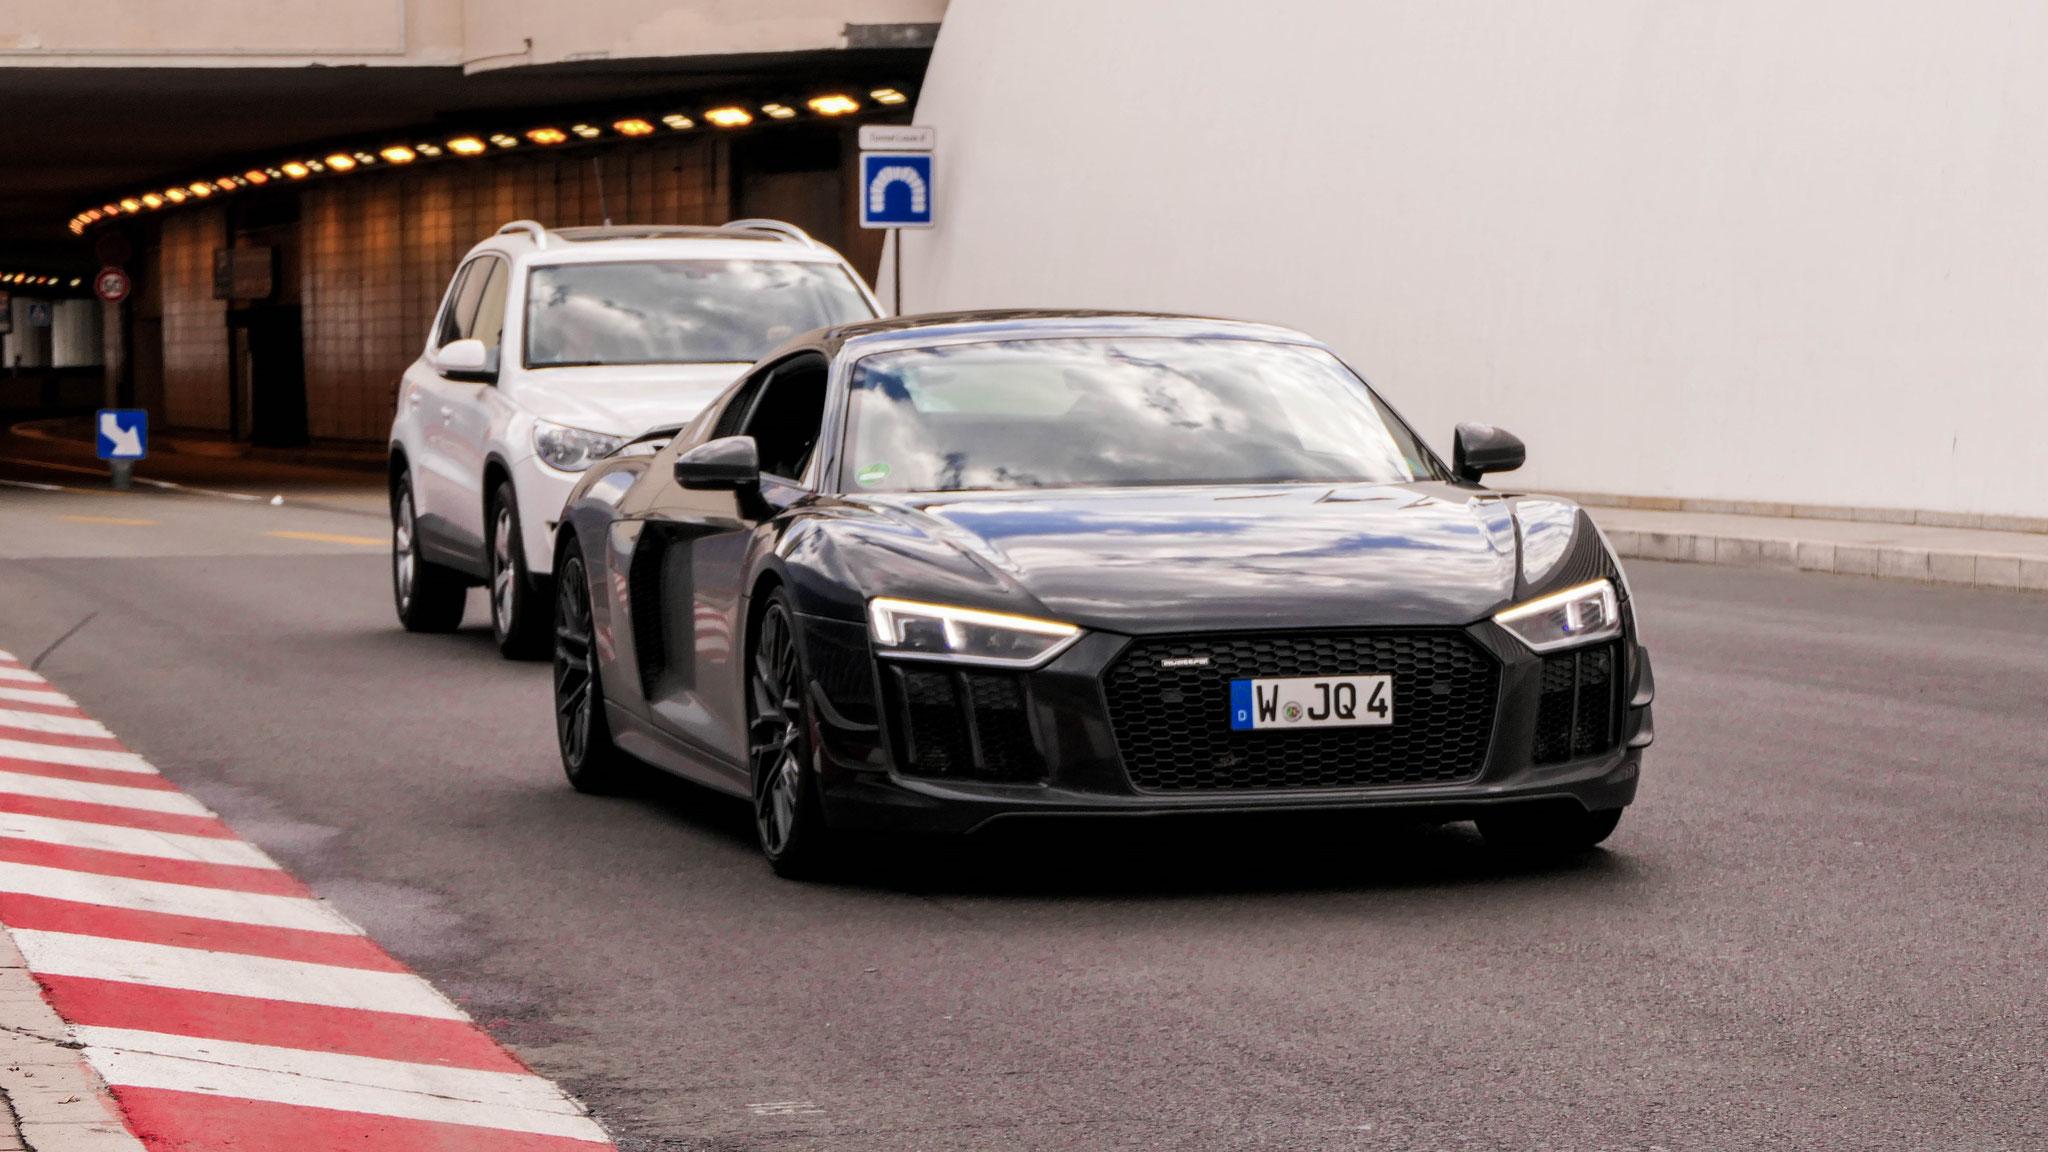 Audi R8 V10 - W-JQ-4